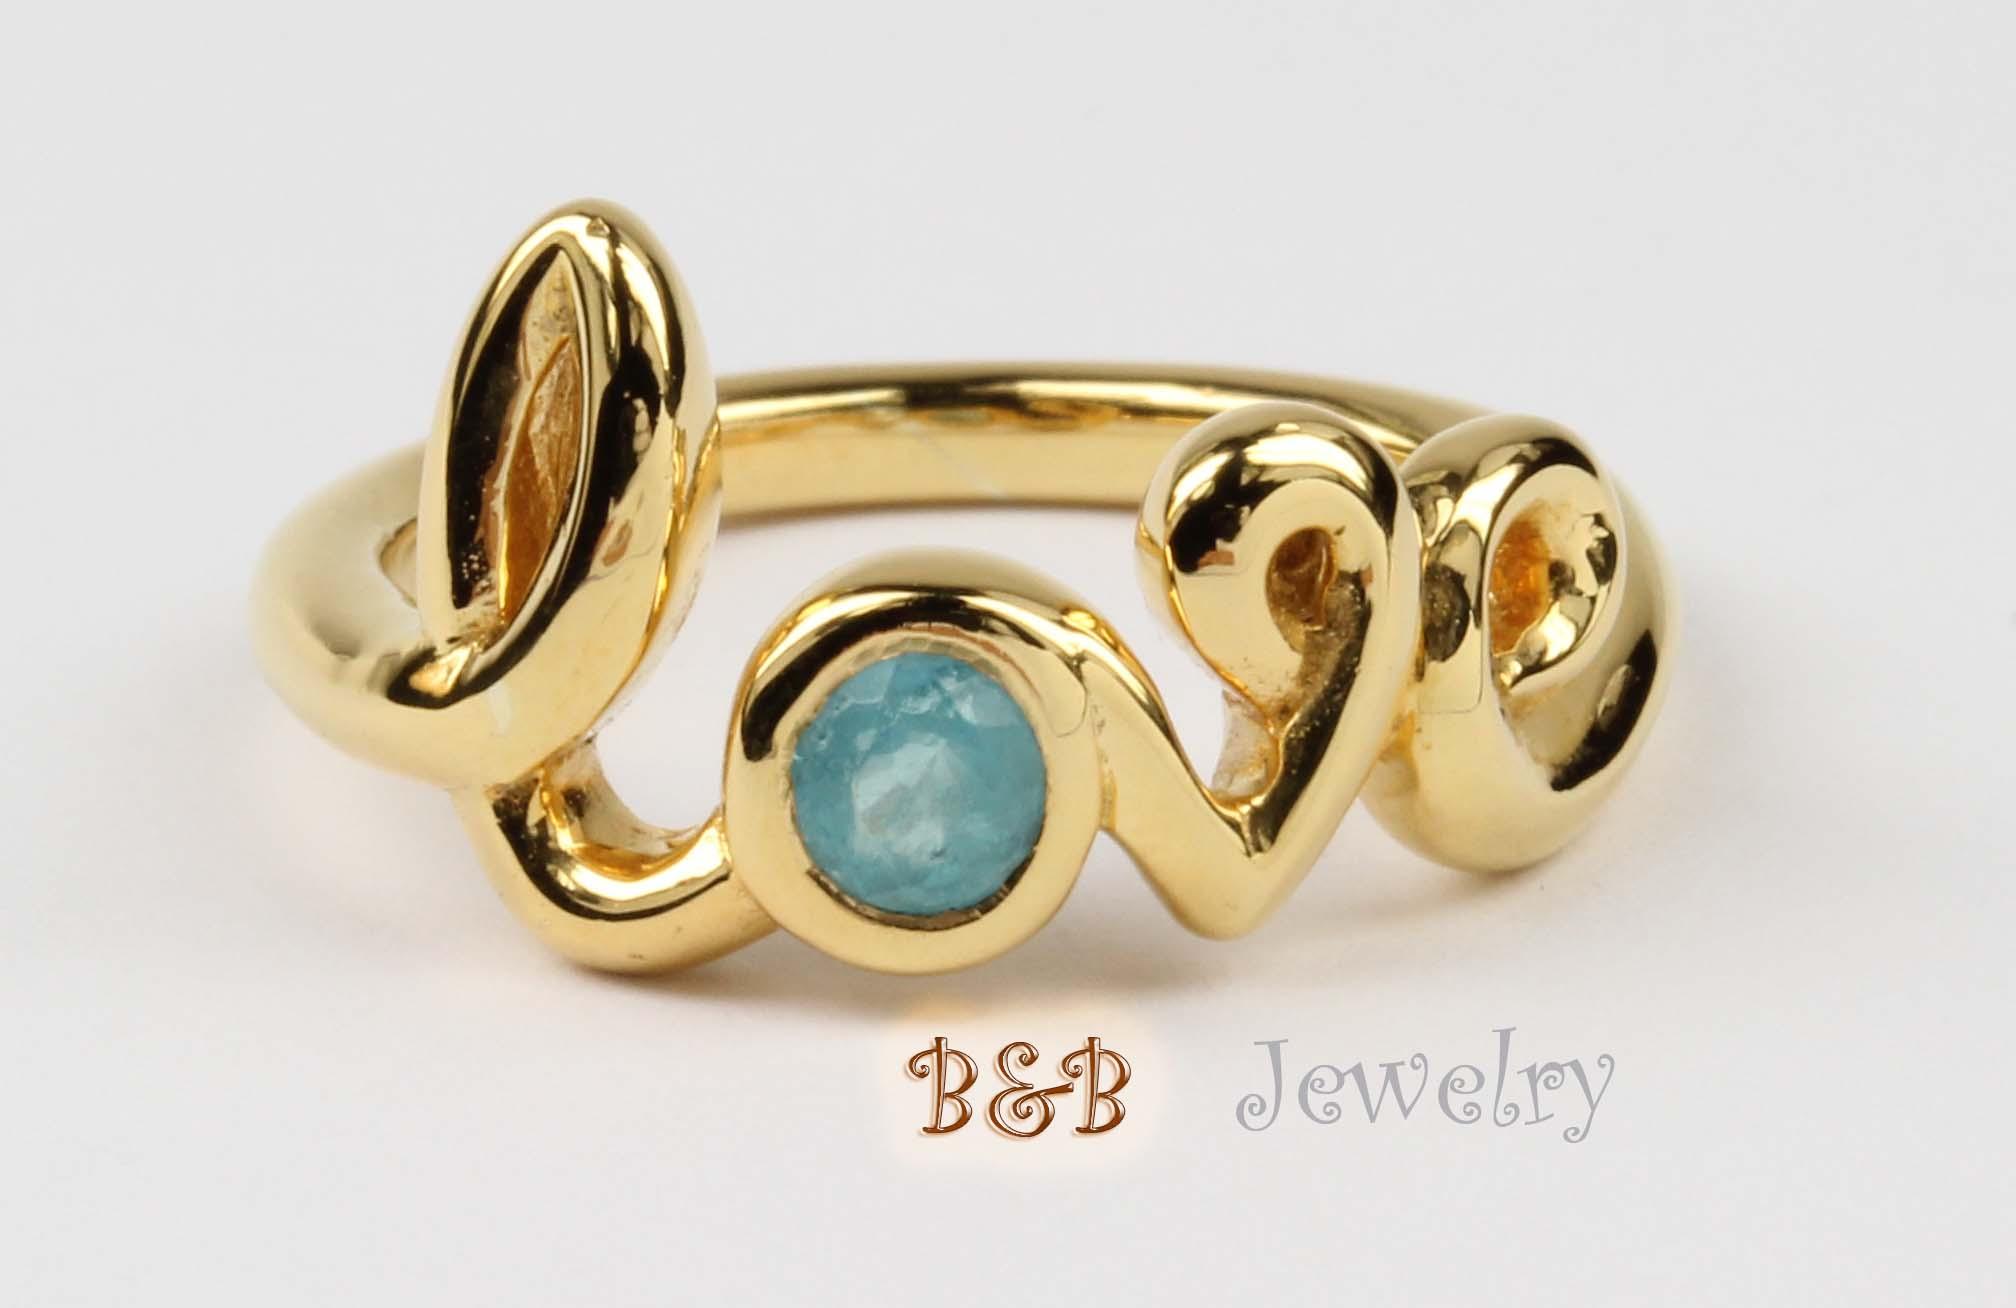 Silver ring_B&B_1713